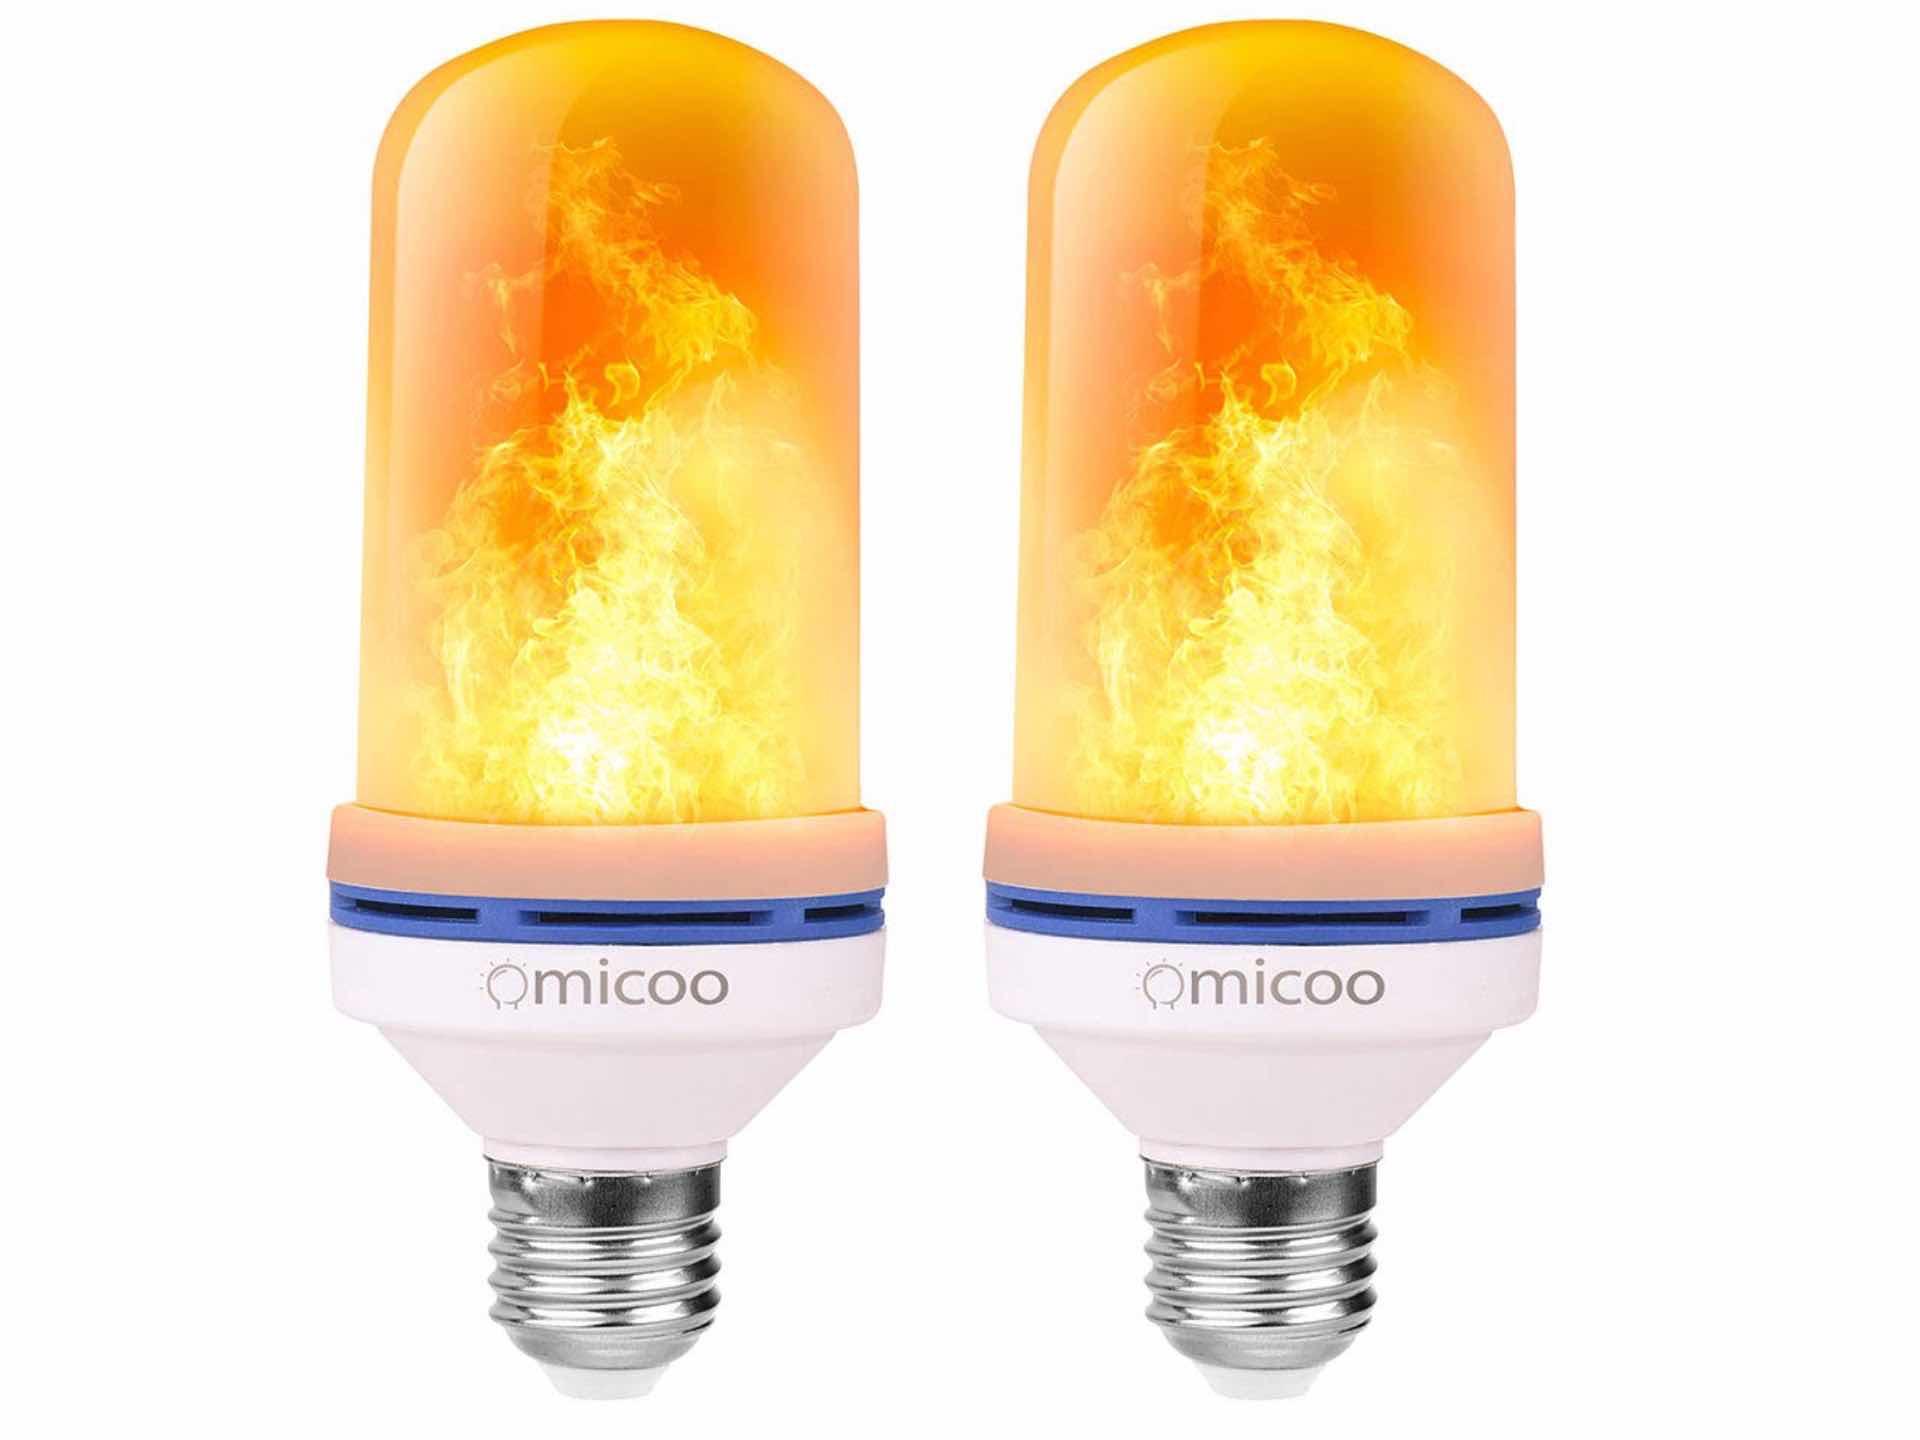 omicoo-led-flame-effect-light-bulb